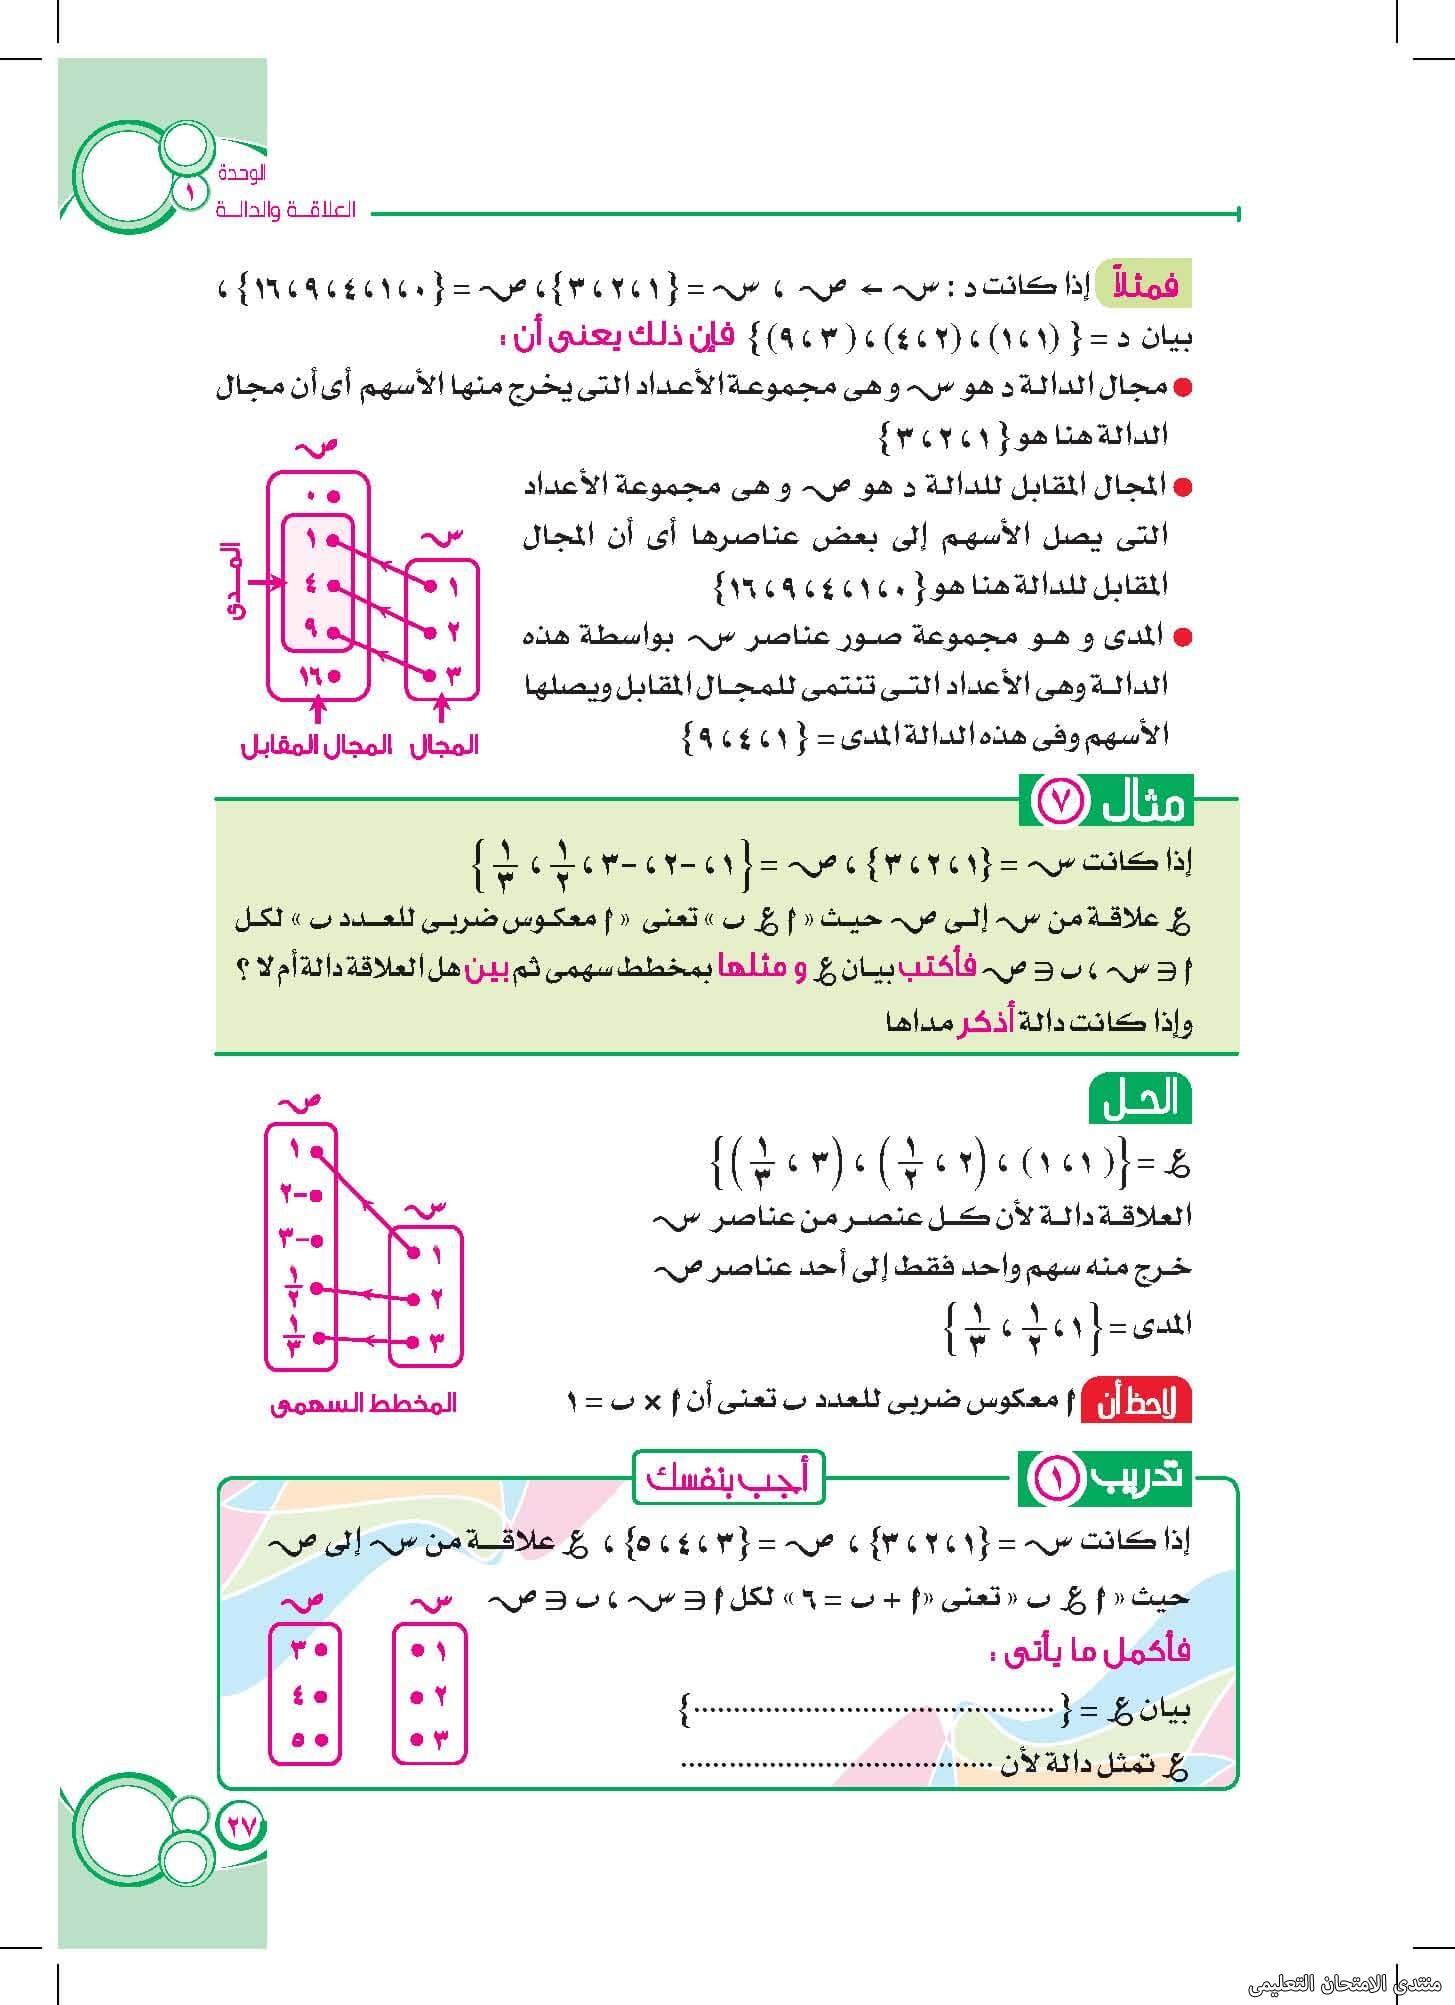 exam-eg.com_163155606978352.jpg